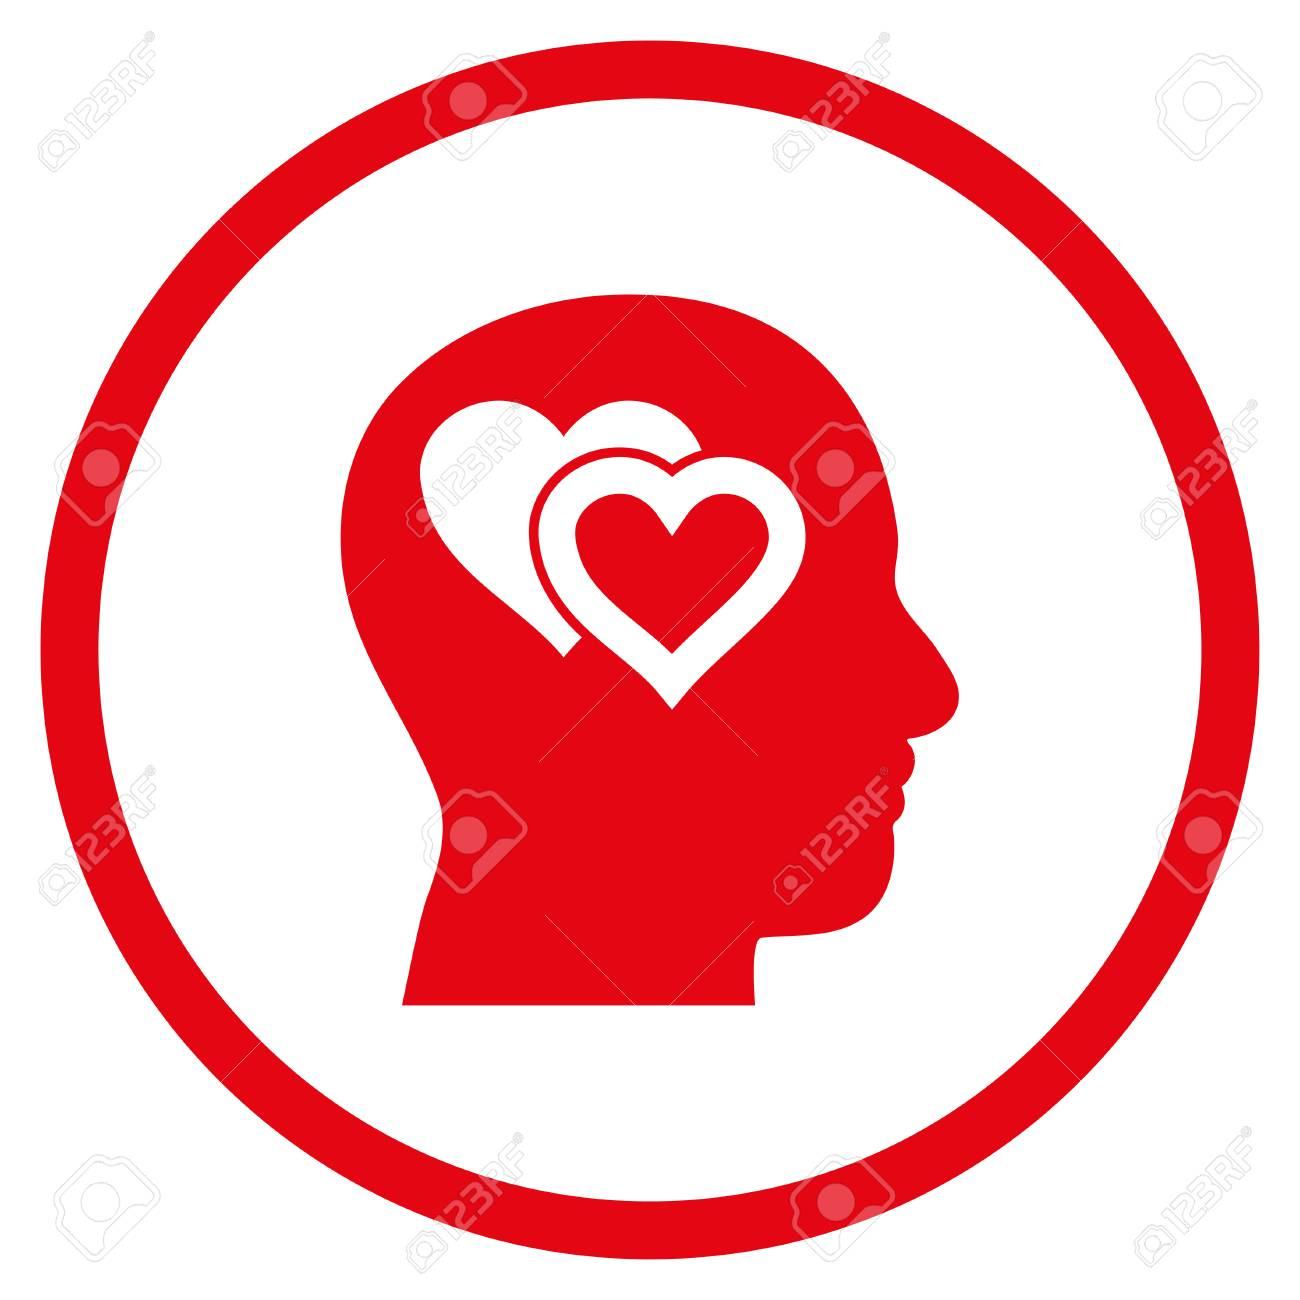 Love in mind rounded icon vector illustration style is flat love in mind rounded icon vector illustration style is flat iconic symbol inside circle buycottarizona